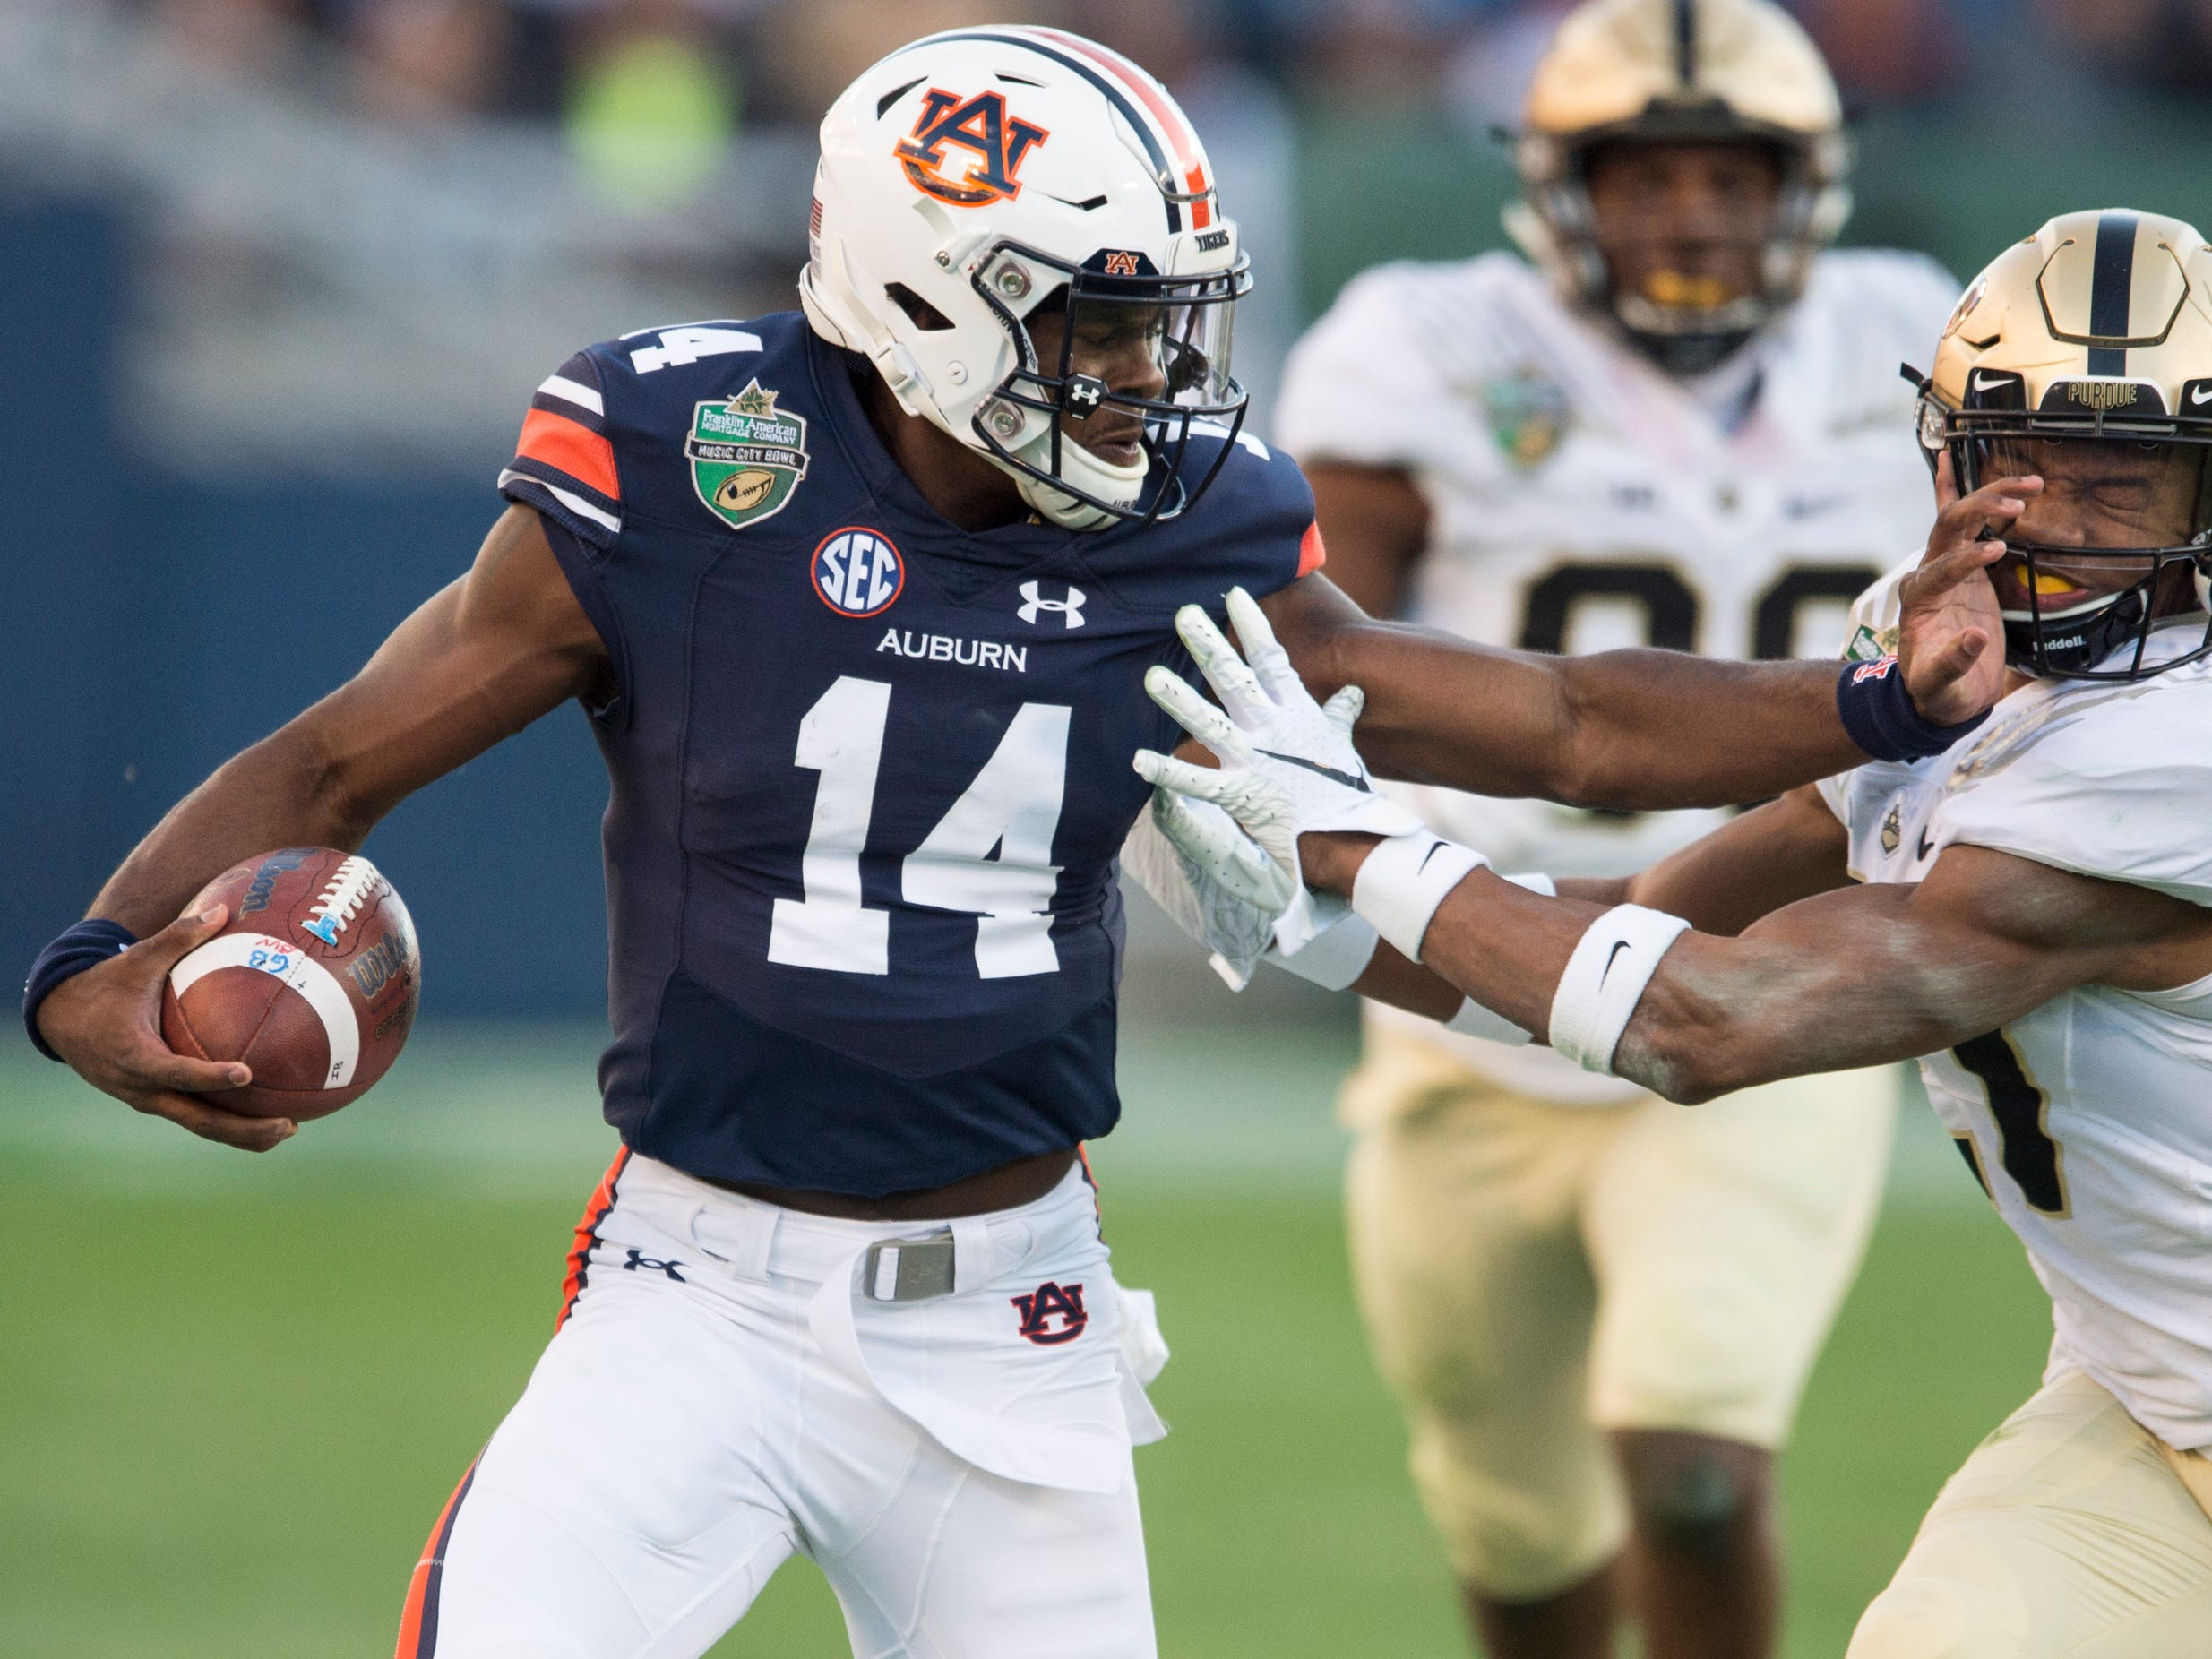 Auburn quarterback Malik Willis (14) stiff arms Purdue linebacker Markus Bailey (21) during the Music City Bowl at Nissan Stadium in Nashville, Tenn., on Friday, Dec. 28, 2018. Auburn defeated Purdue 63-14.